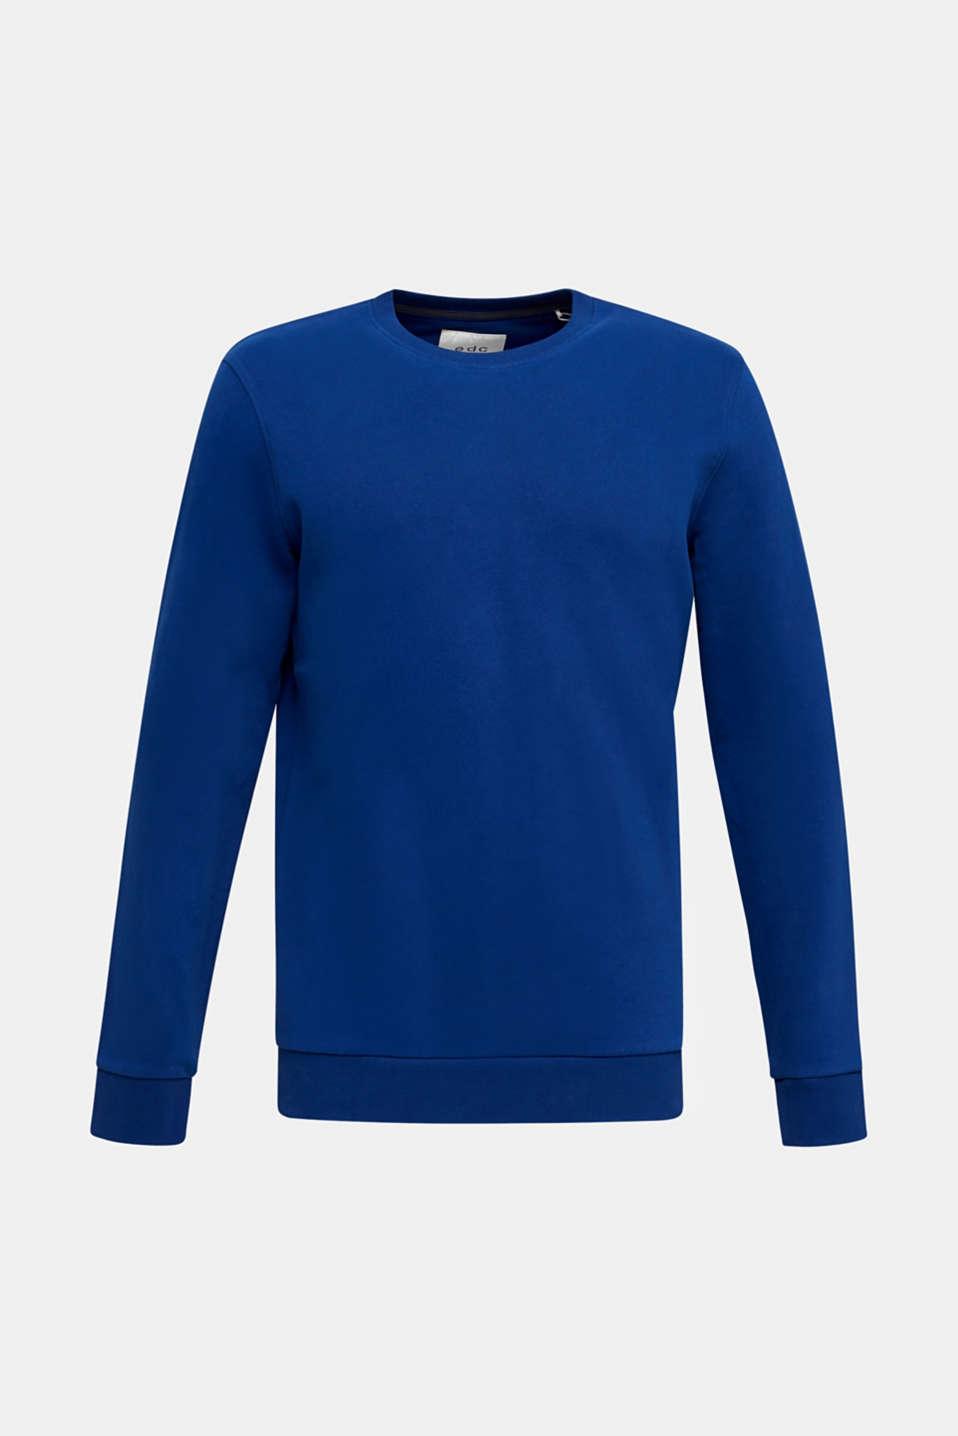 Sweatshirt in 100% cotton, INK, detail image number 7